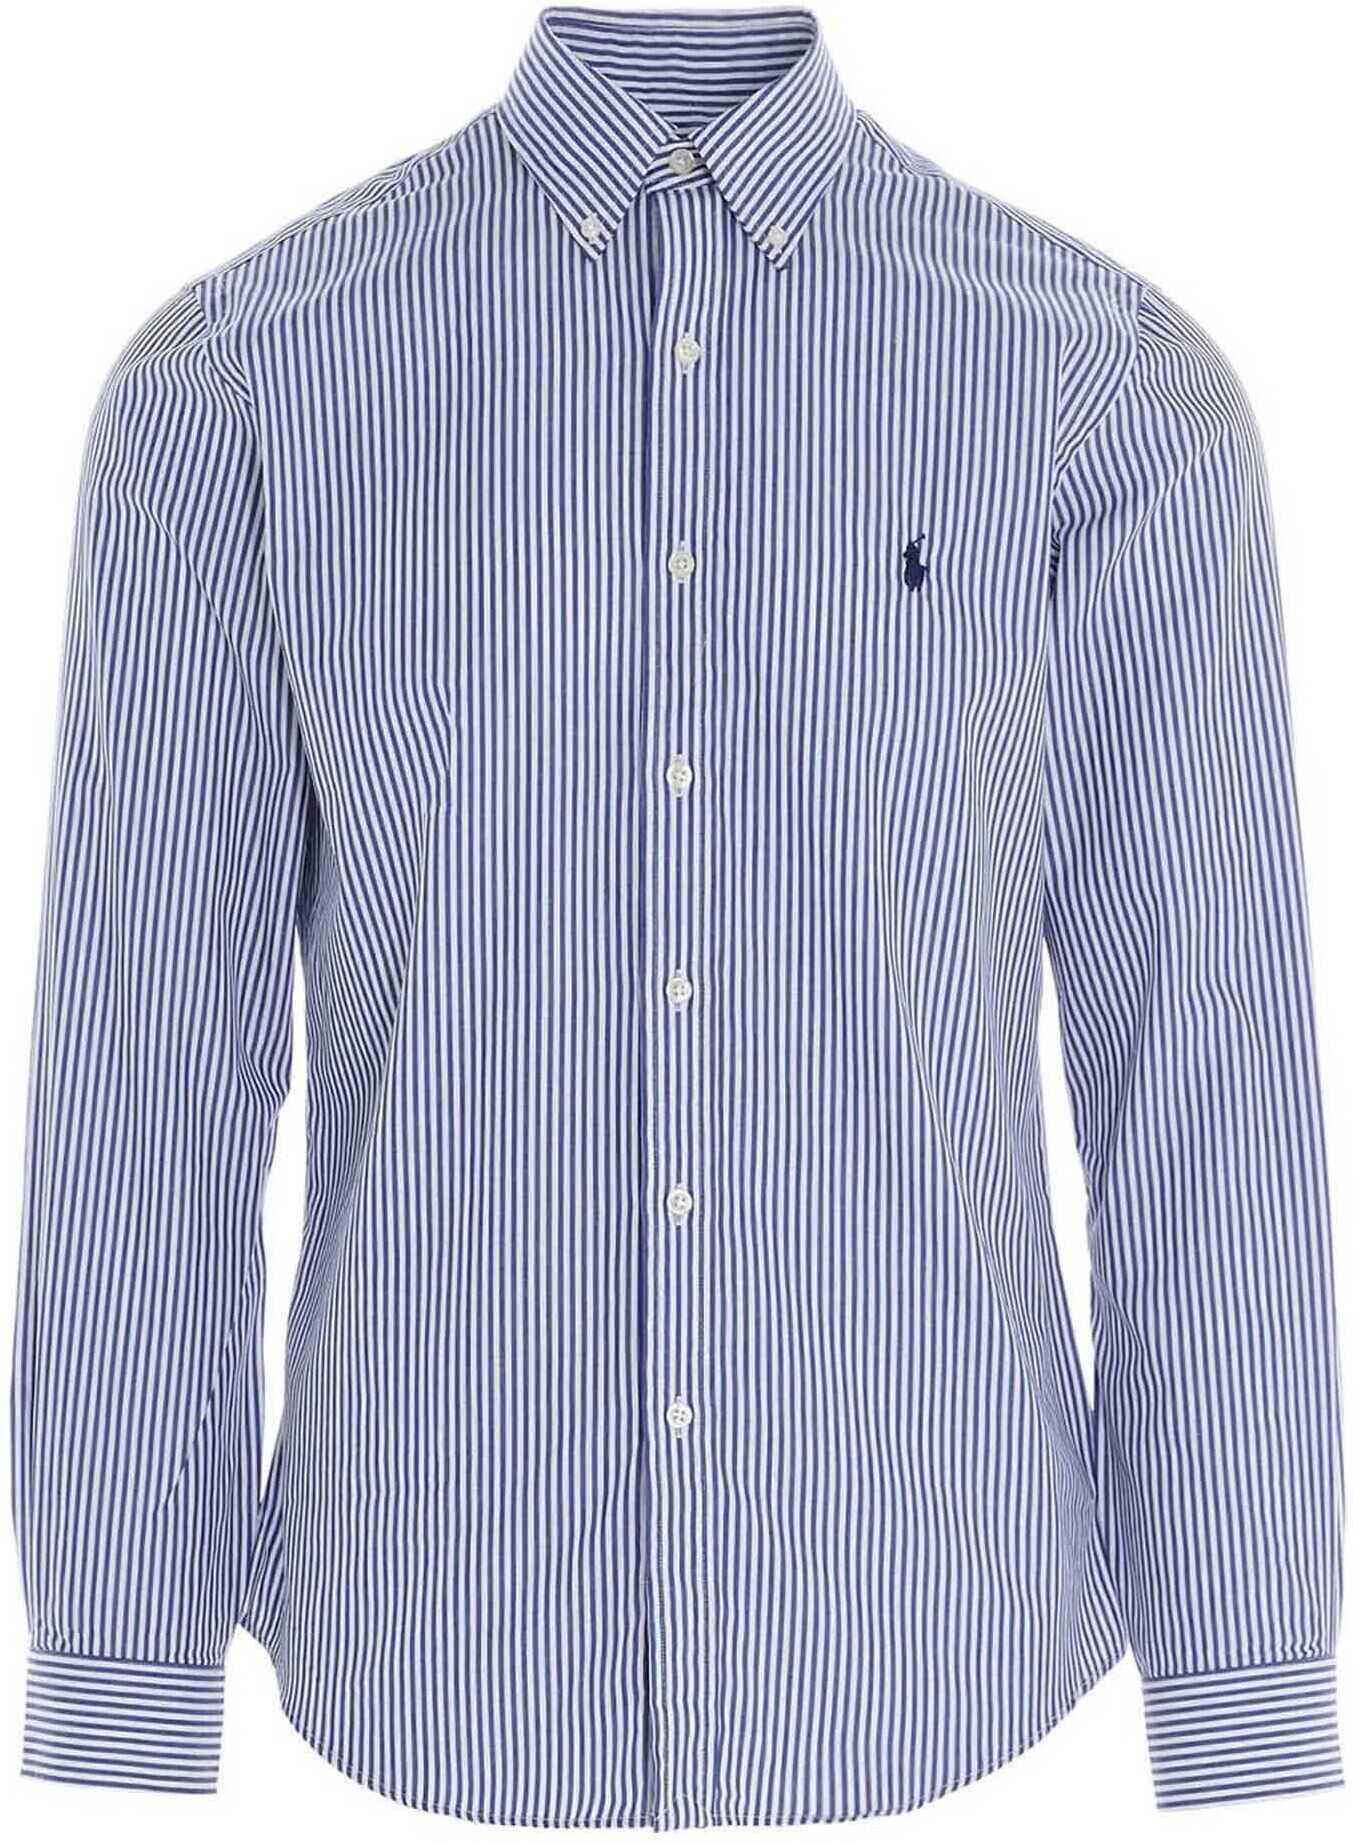 Ralph Lauren Striped Blue And White Shirt Blue imagine